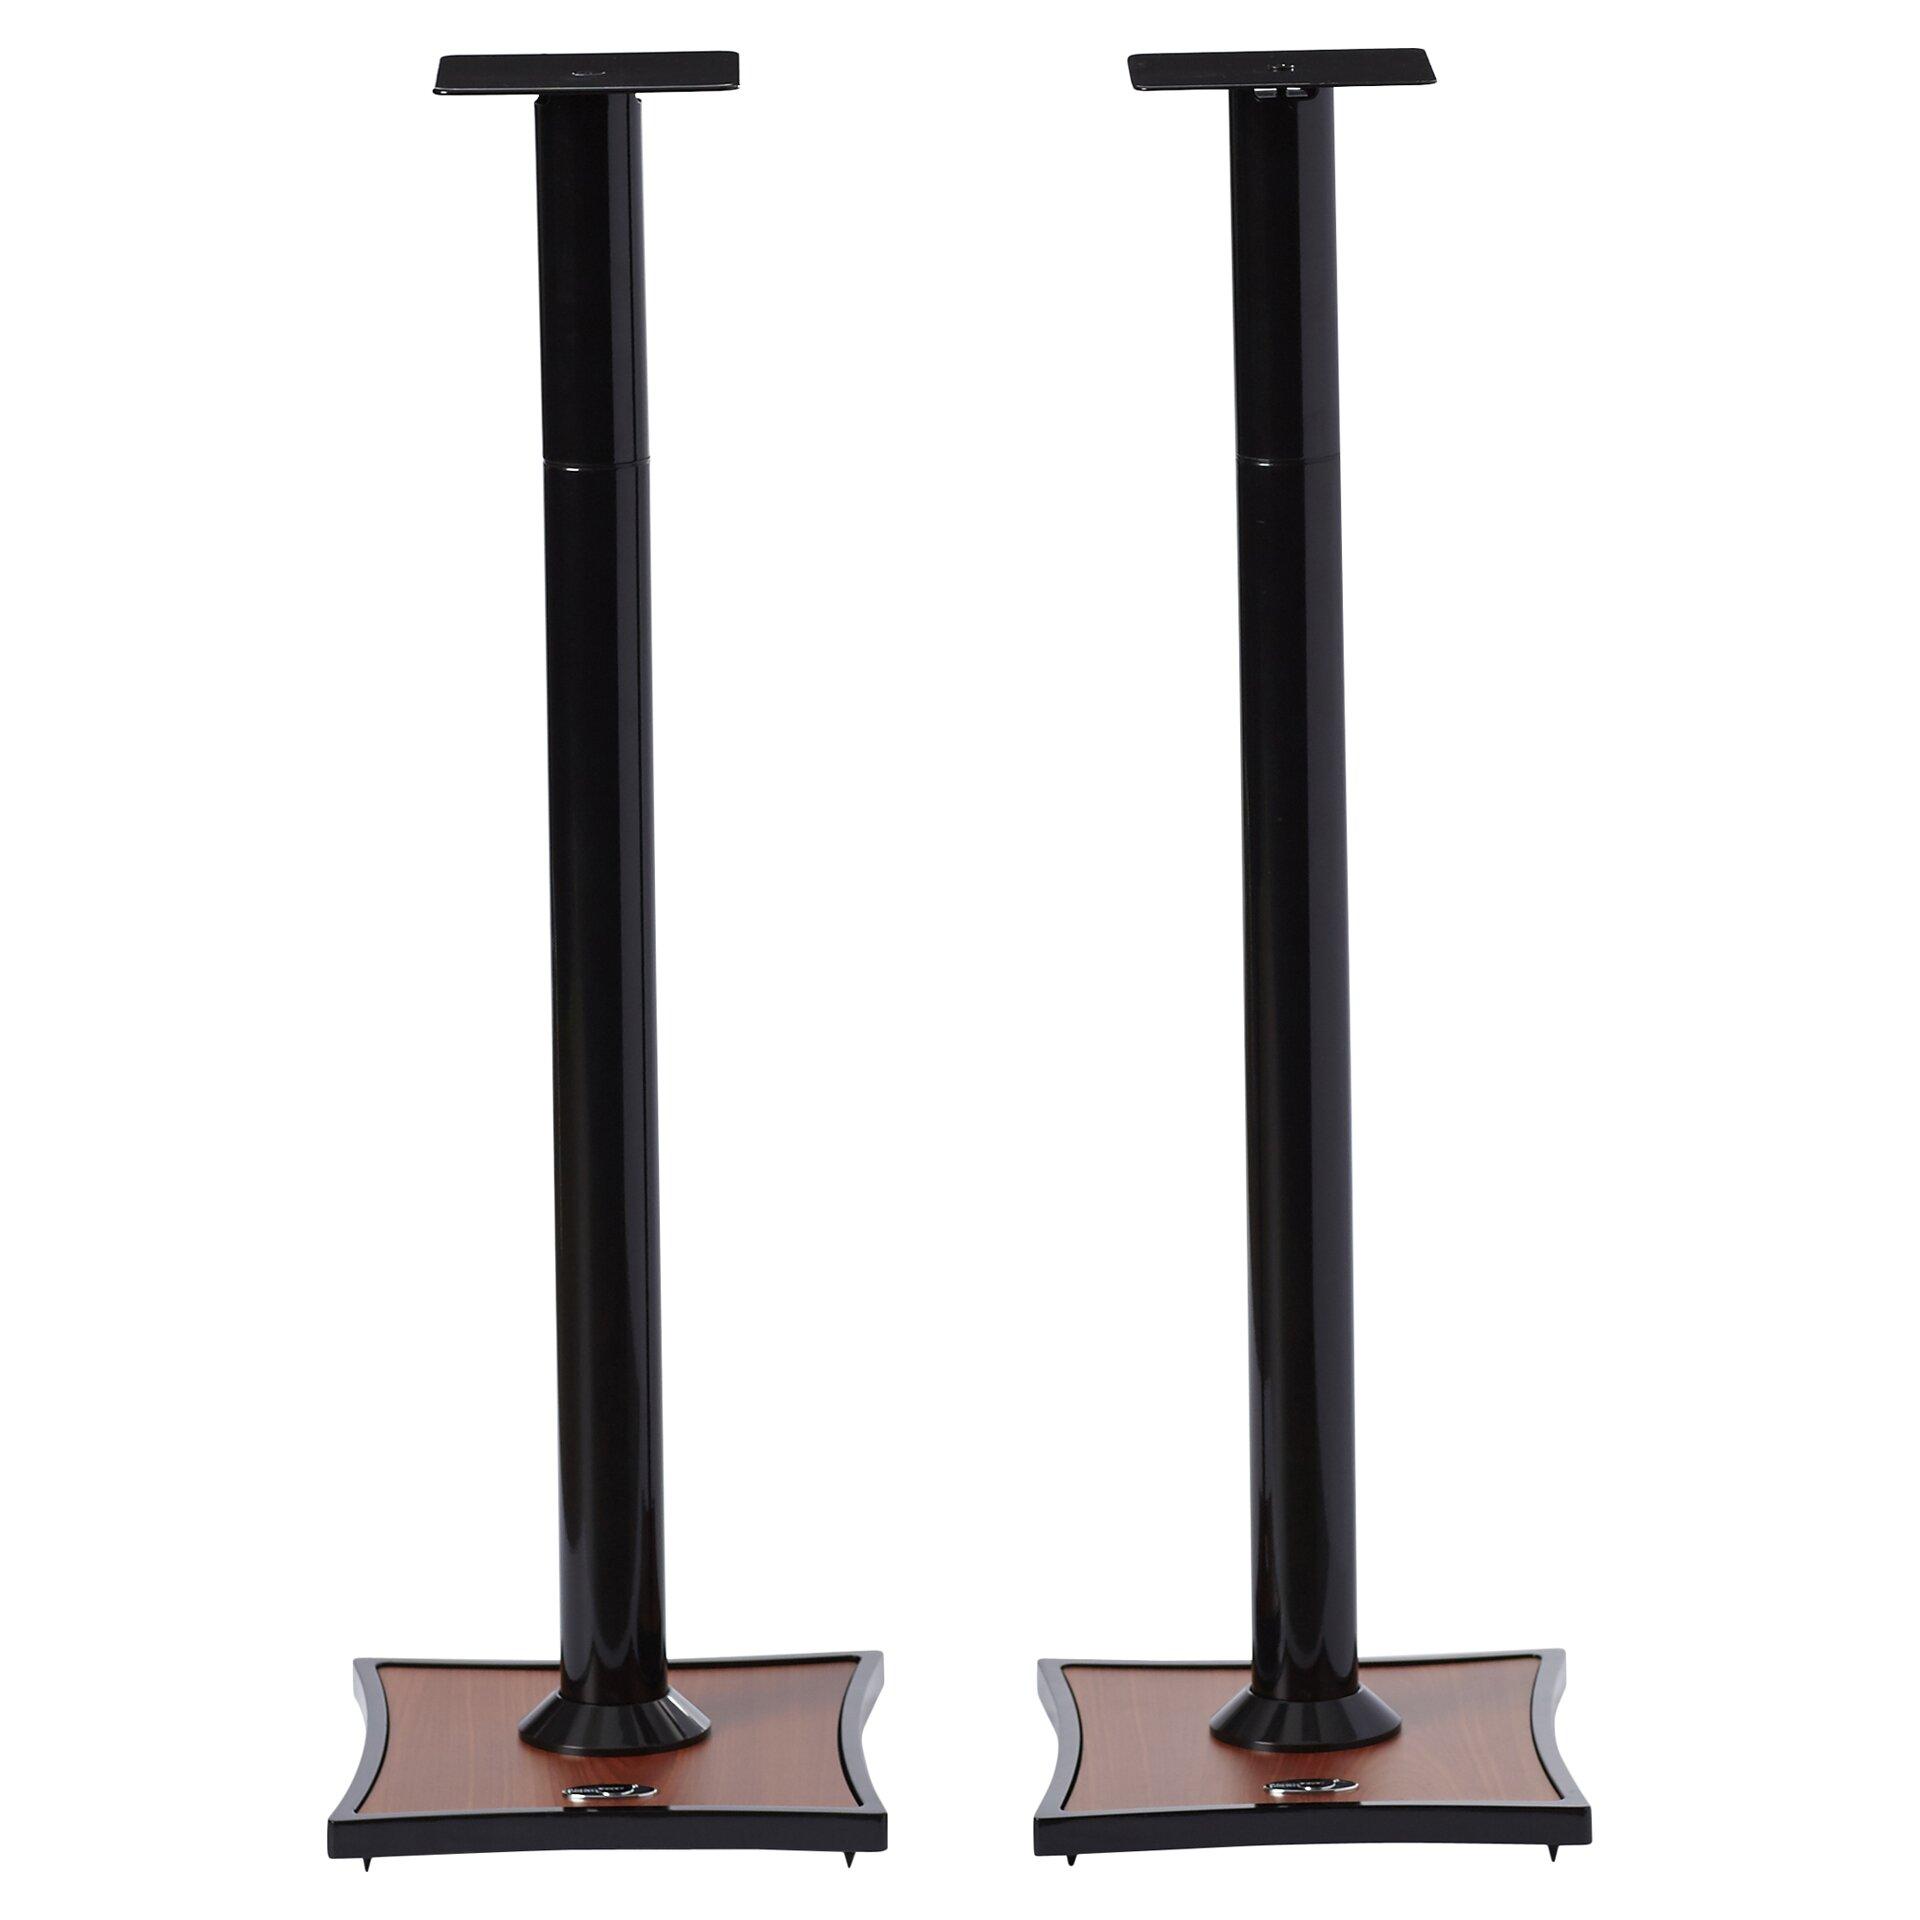 Omnimount gemini series adjustable bookshelf speaker stand for Stand 2 b